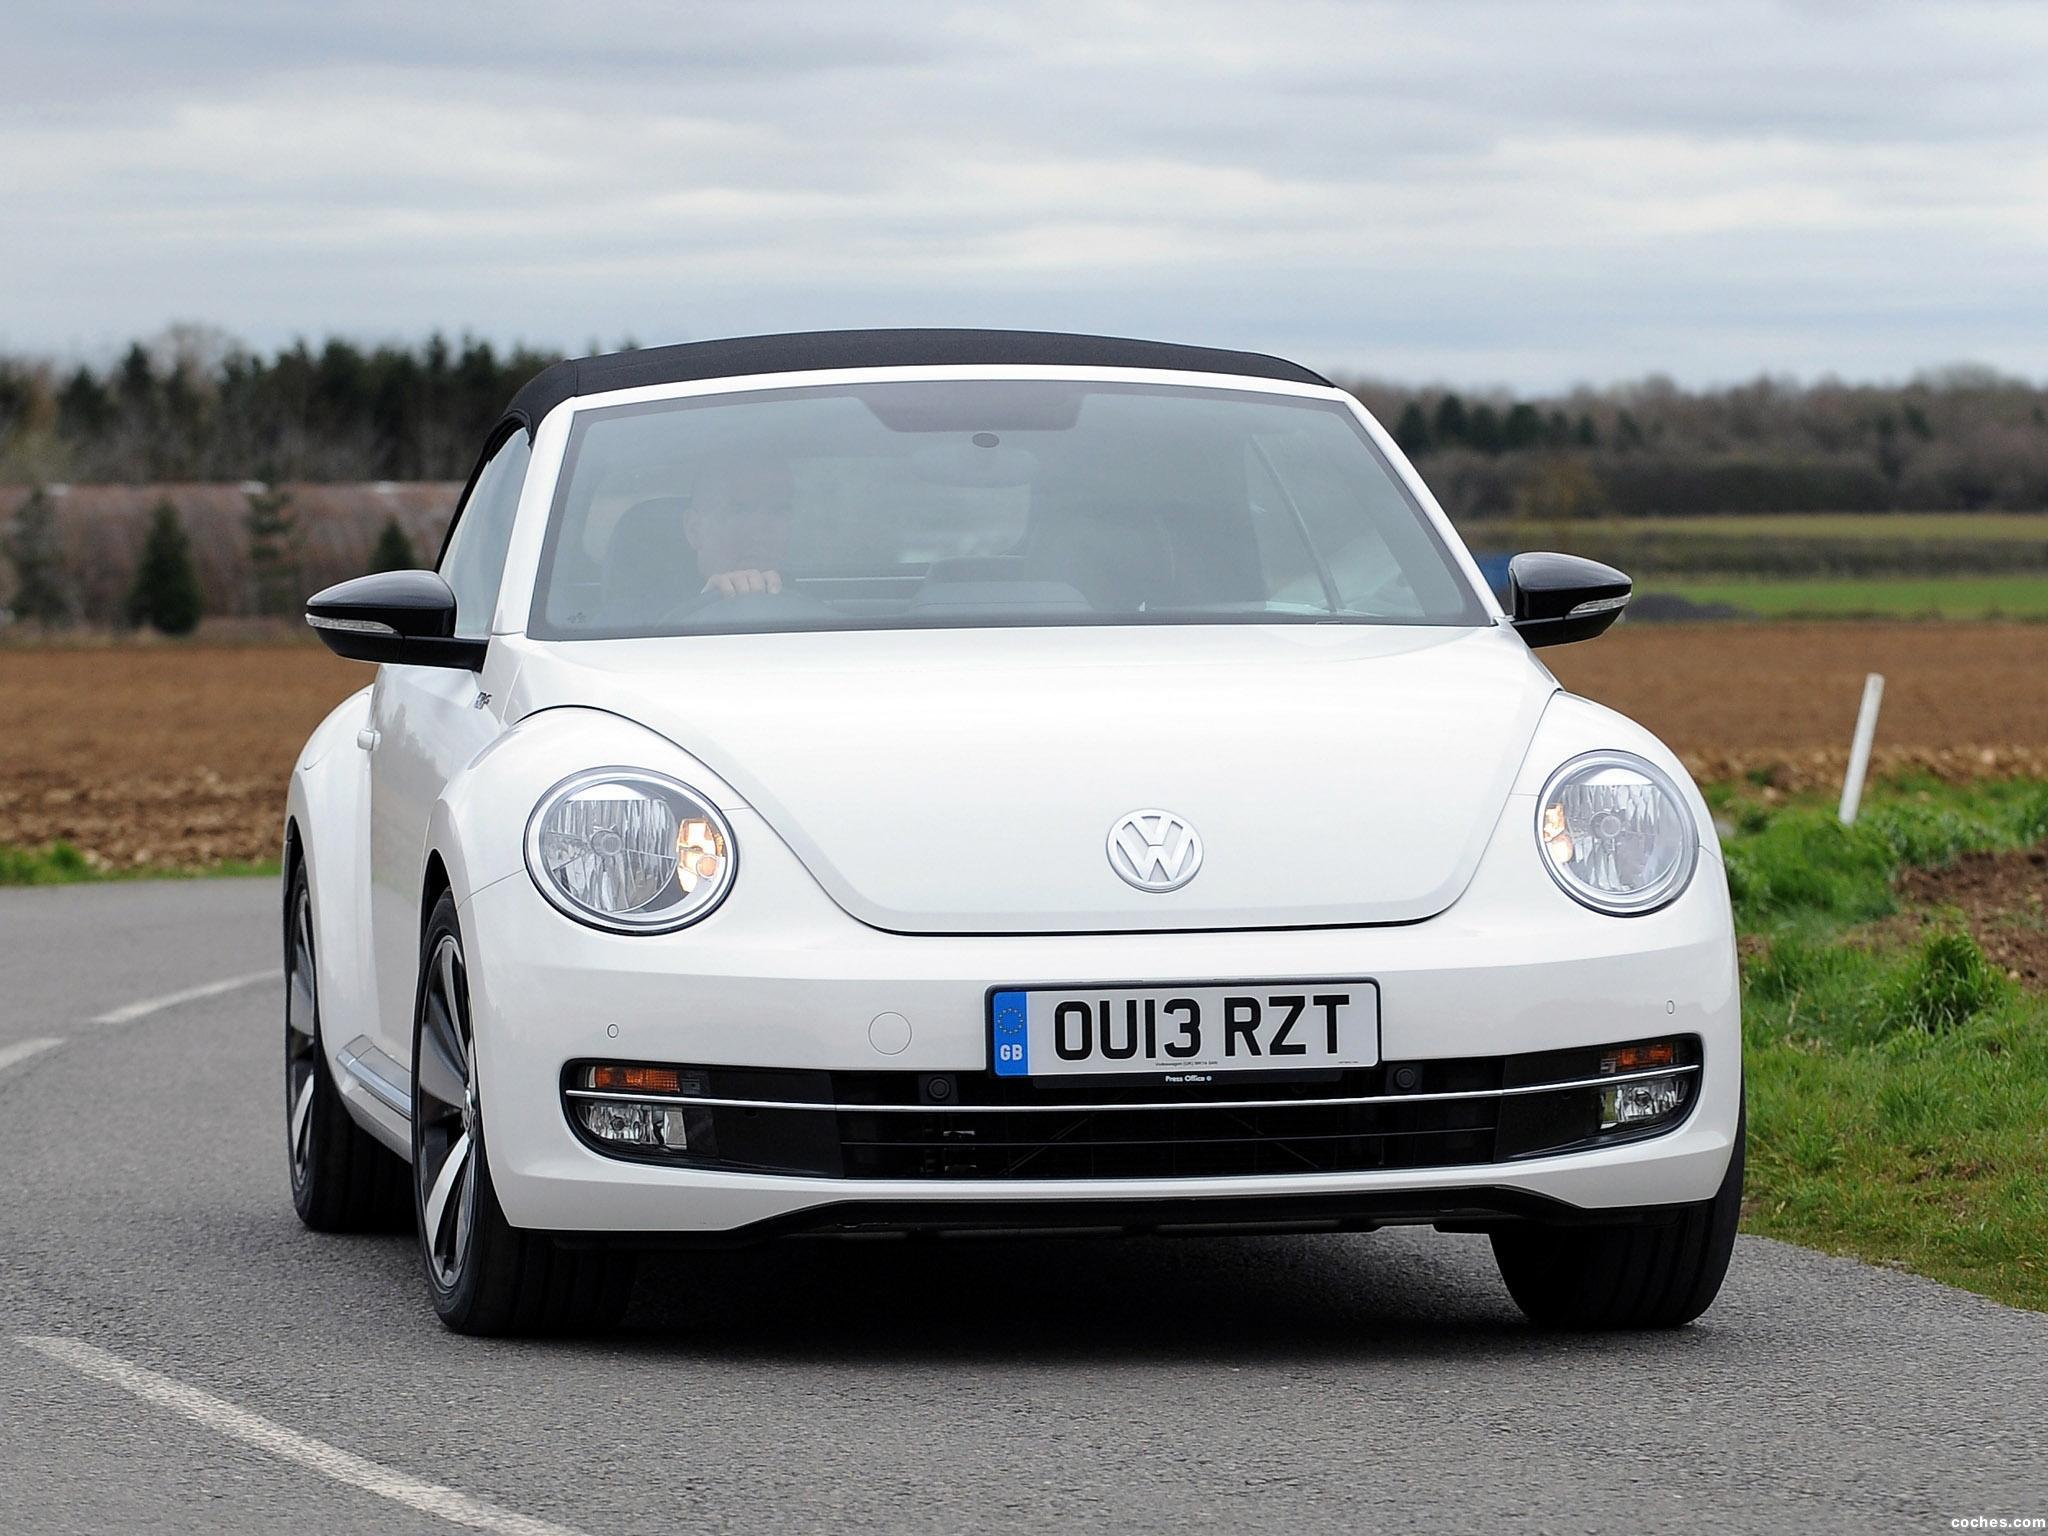 volkswagen_beetle-cabrio-60s-edition-uk-2013_r13.jpg